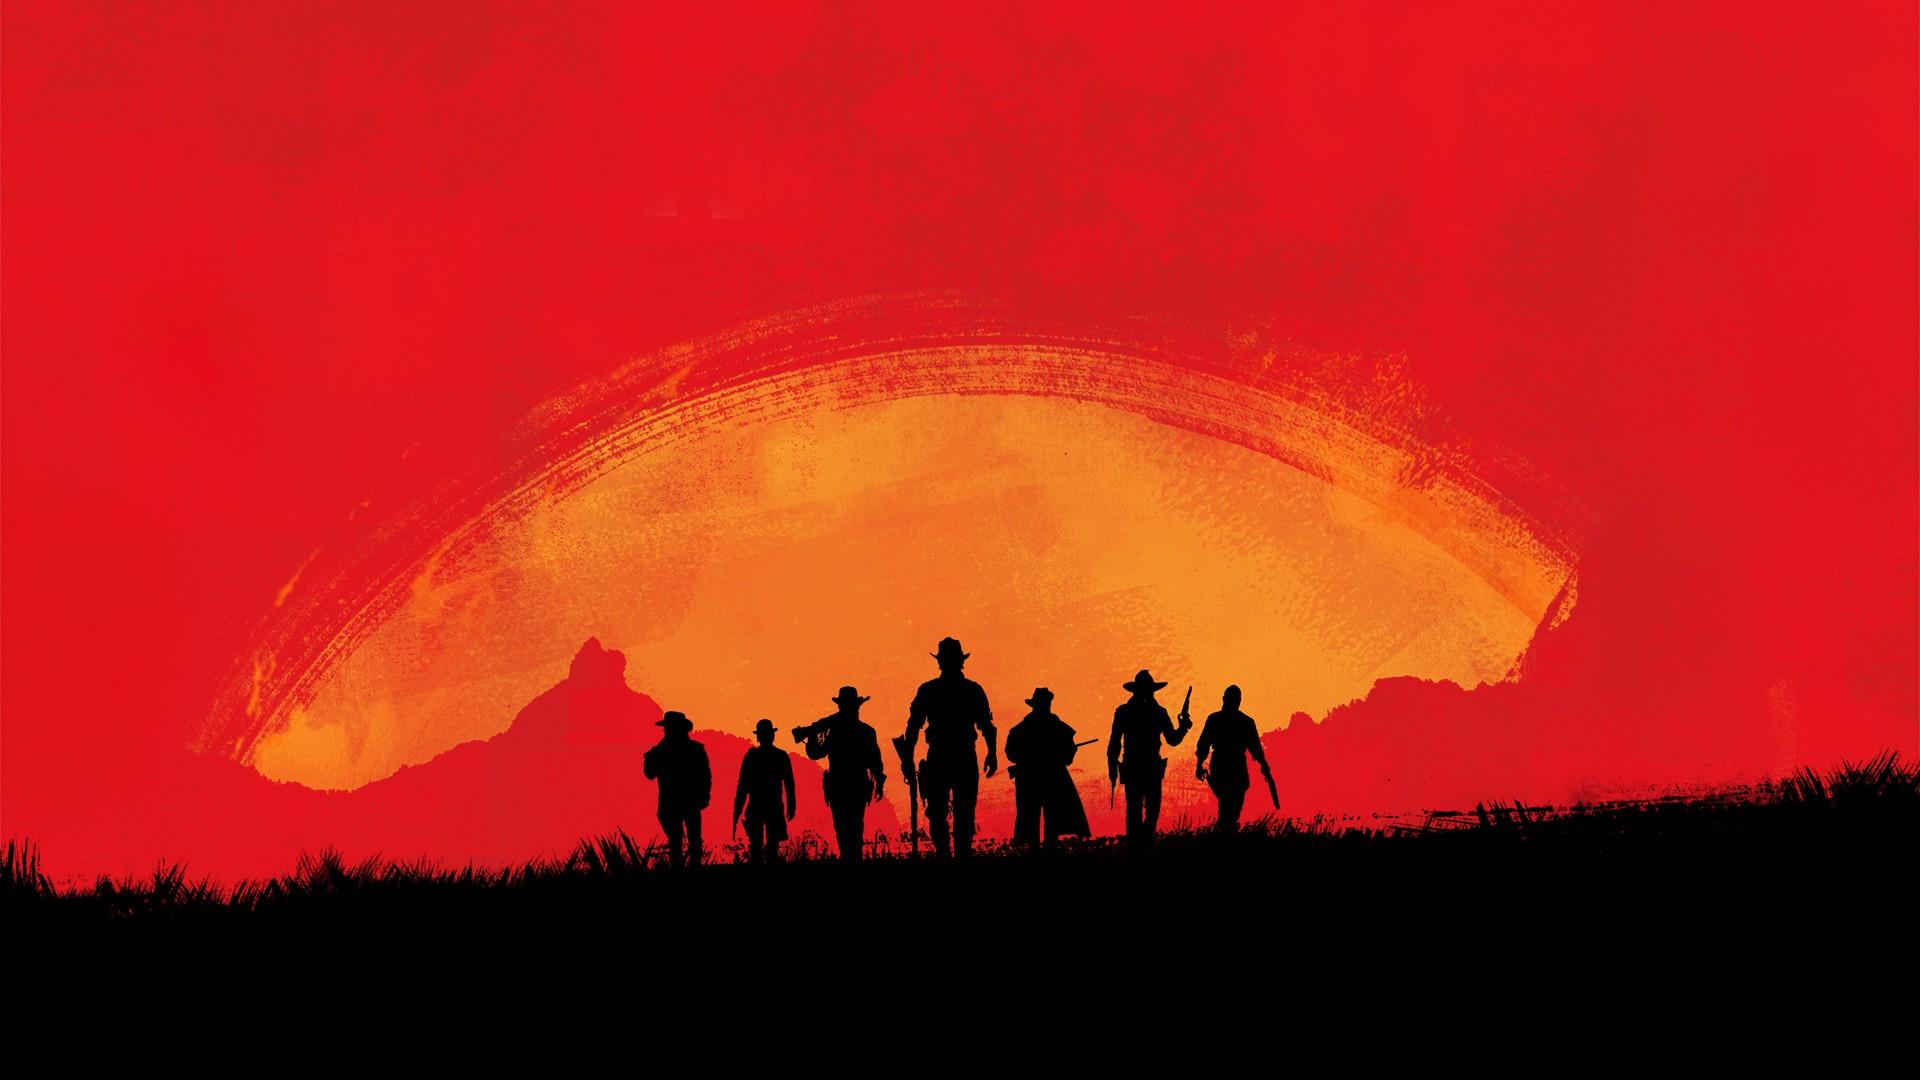 General 1920x1080 Red Dead 3 Rockstar Games Red Dead Redemption 2 Red Dead Redemption